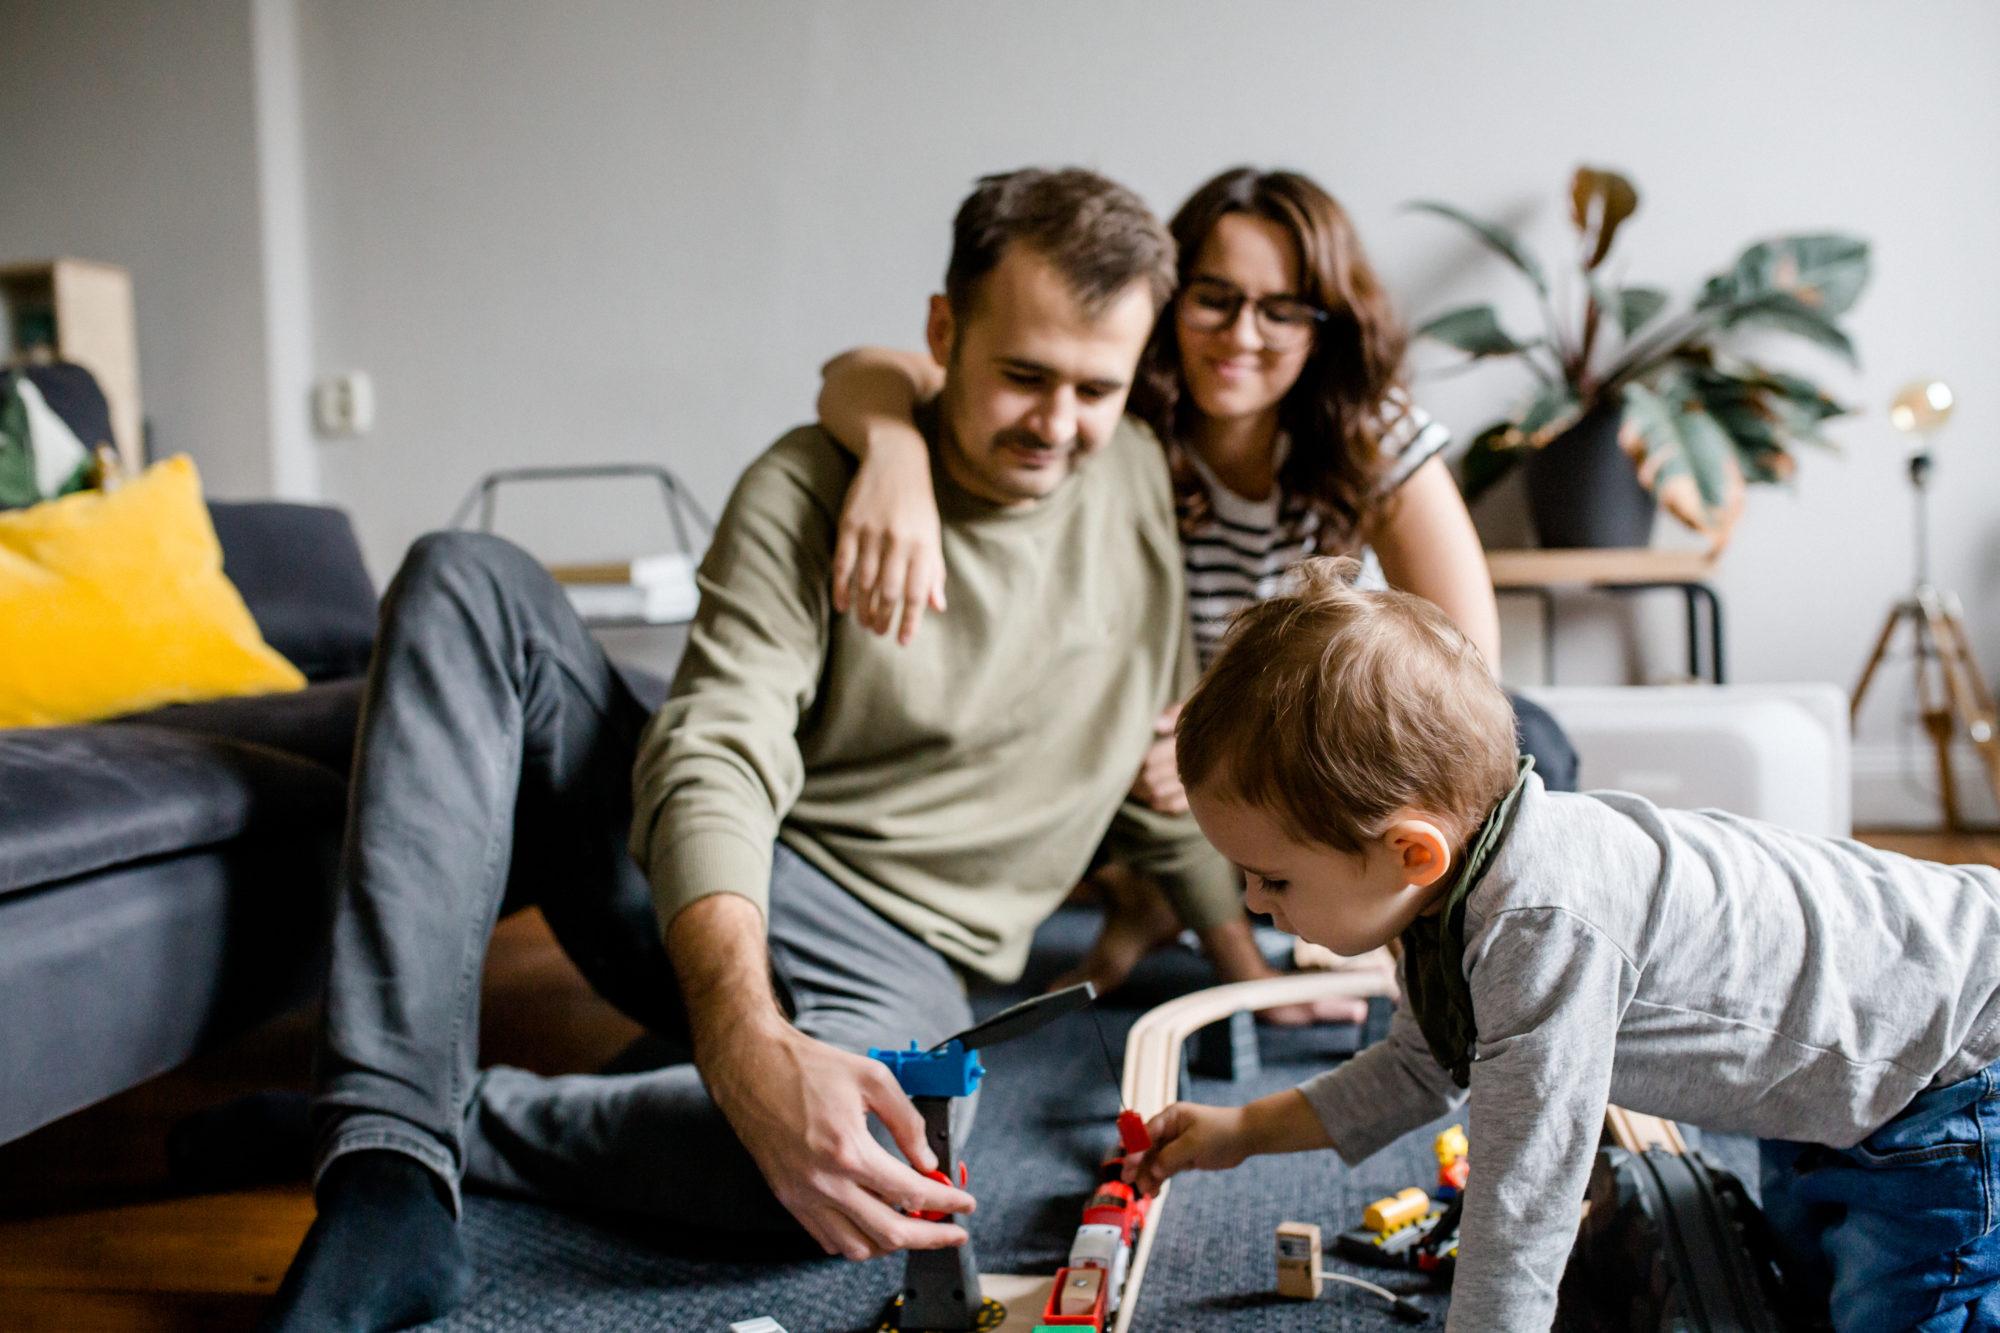 Familienshooting mit Jana Richter | Familienbilder